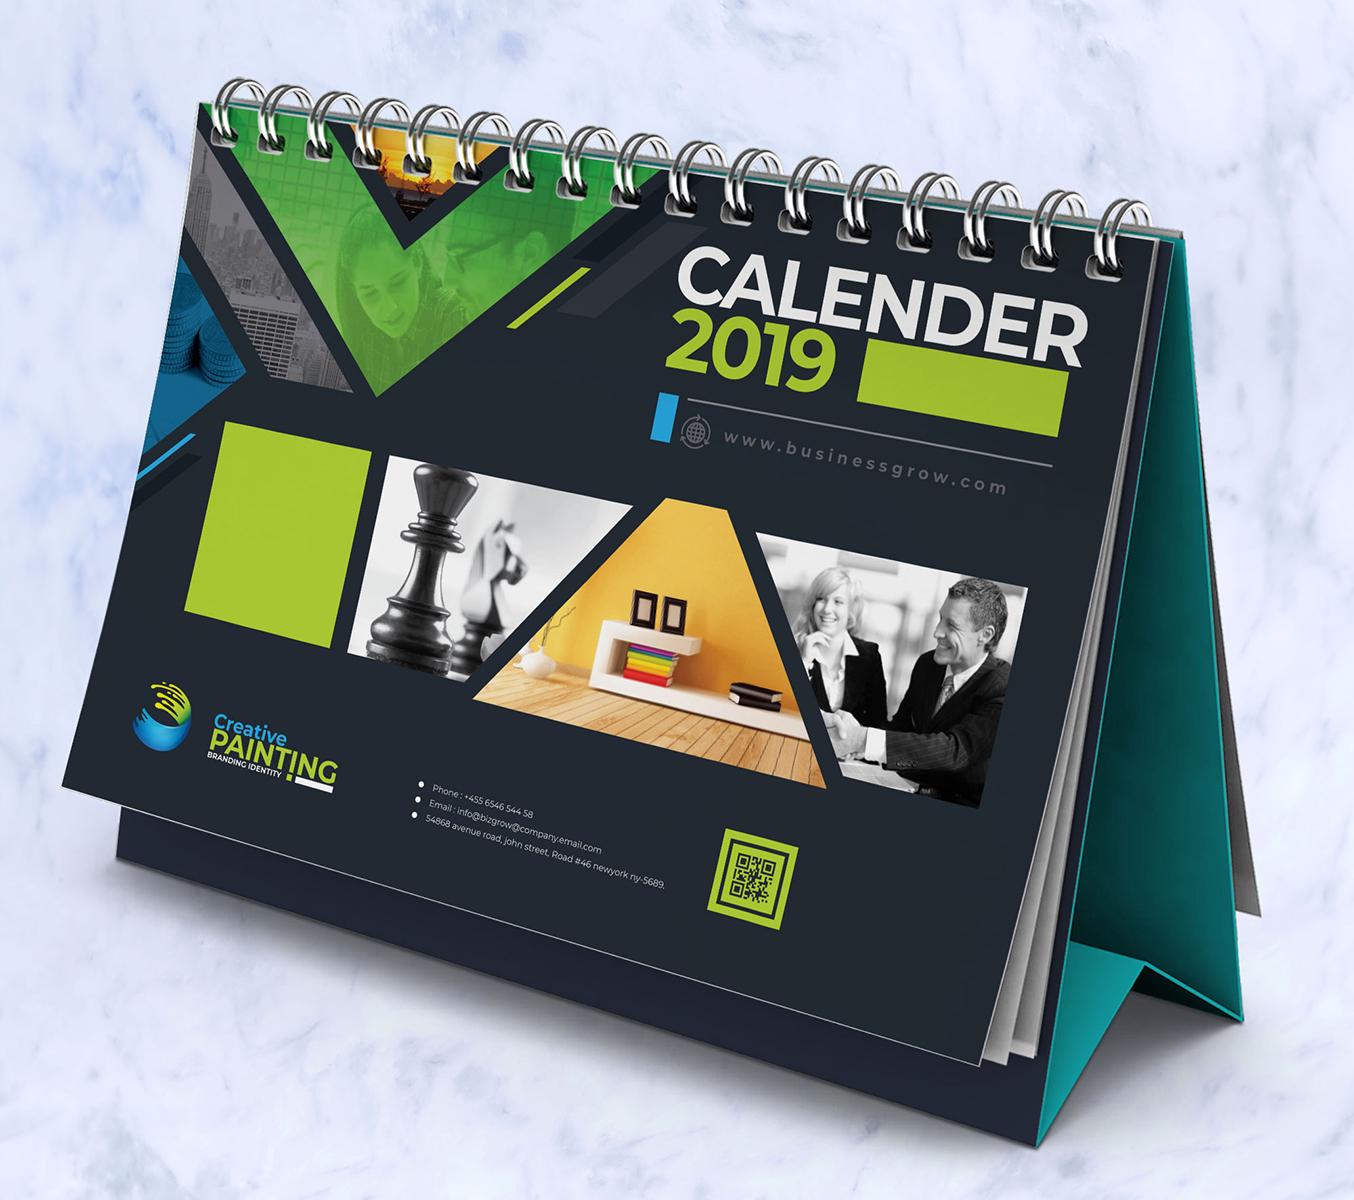 2019 wall and desk calendar design corporate identity template  66146